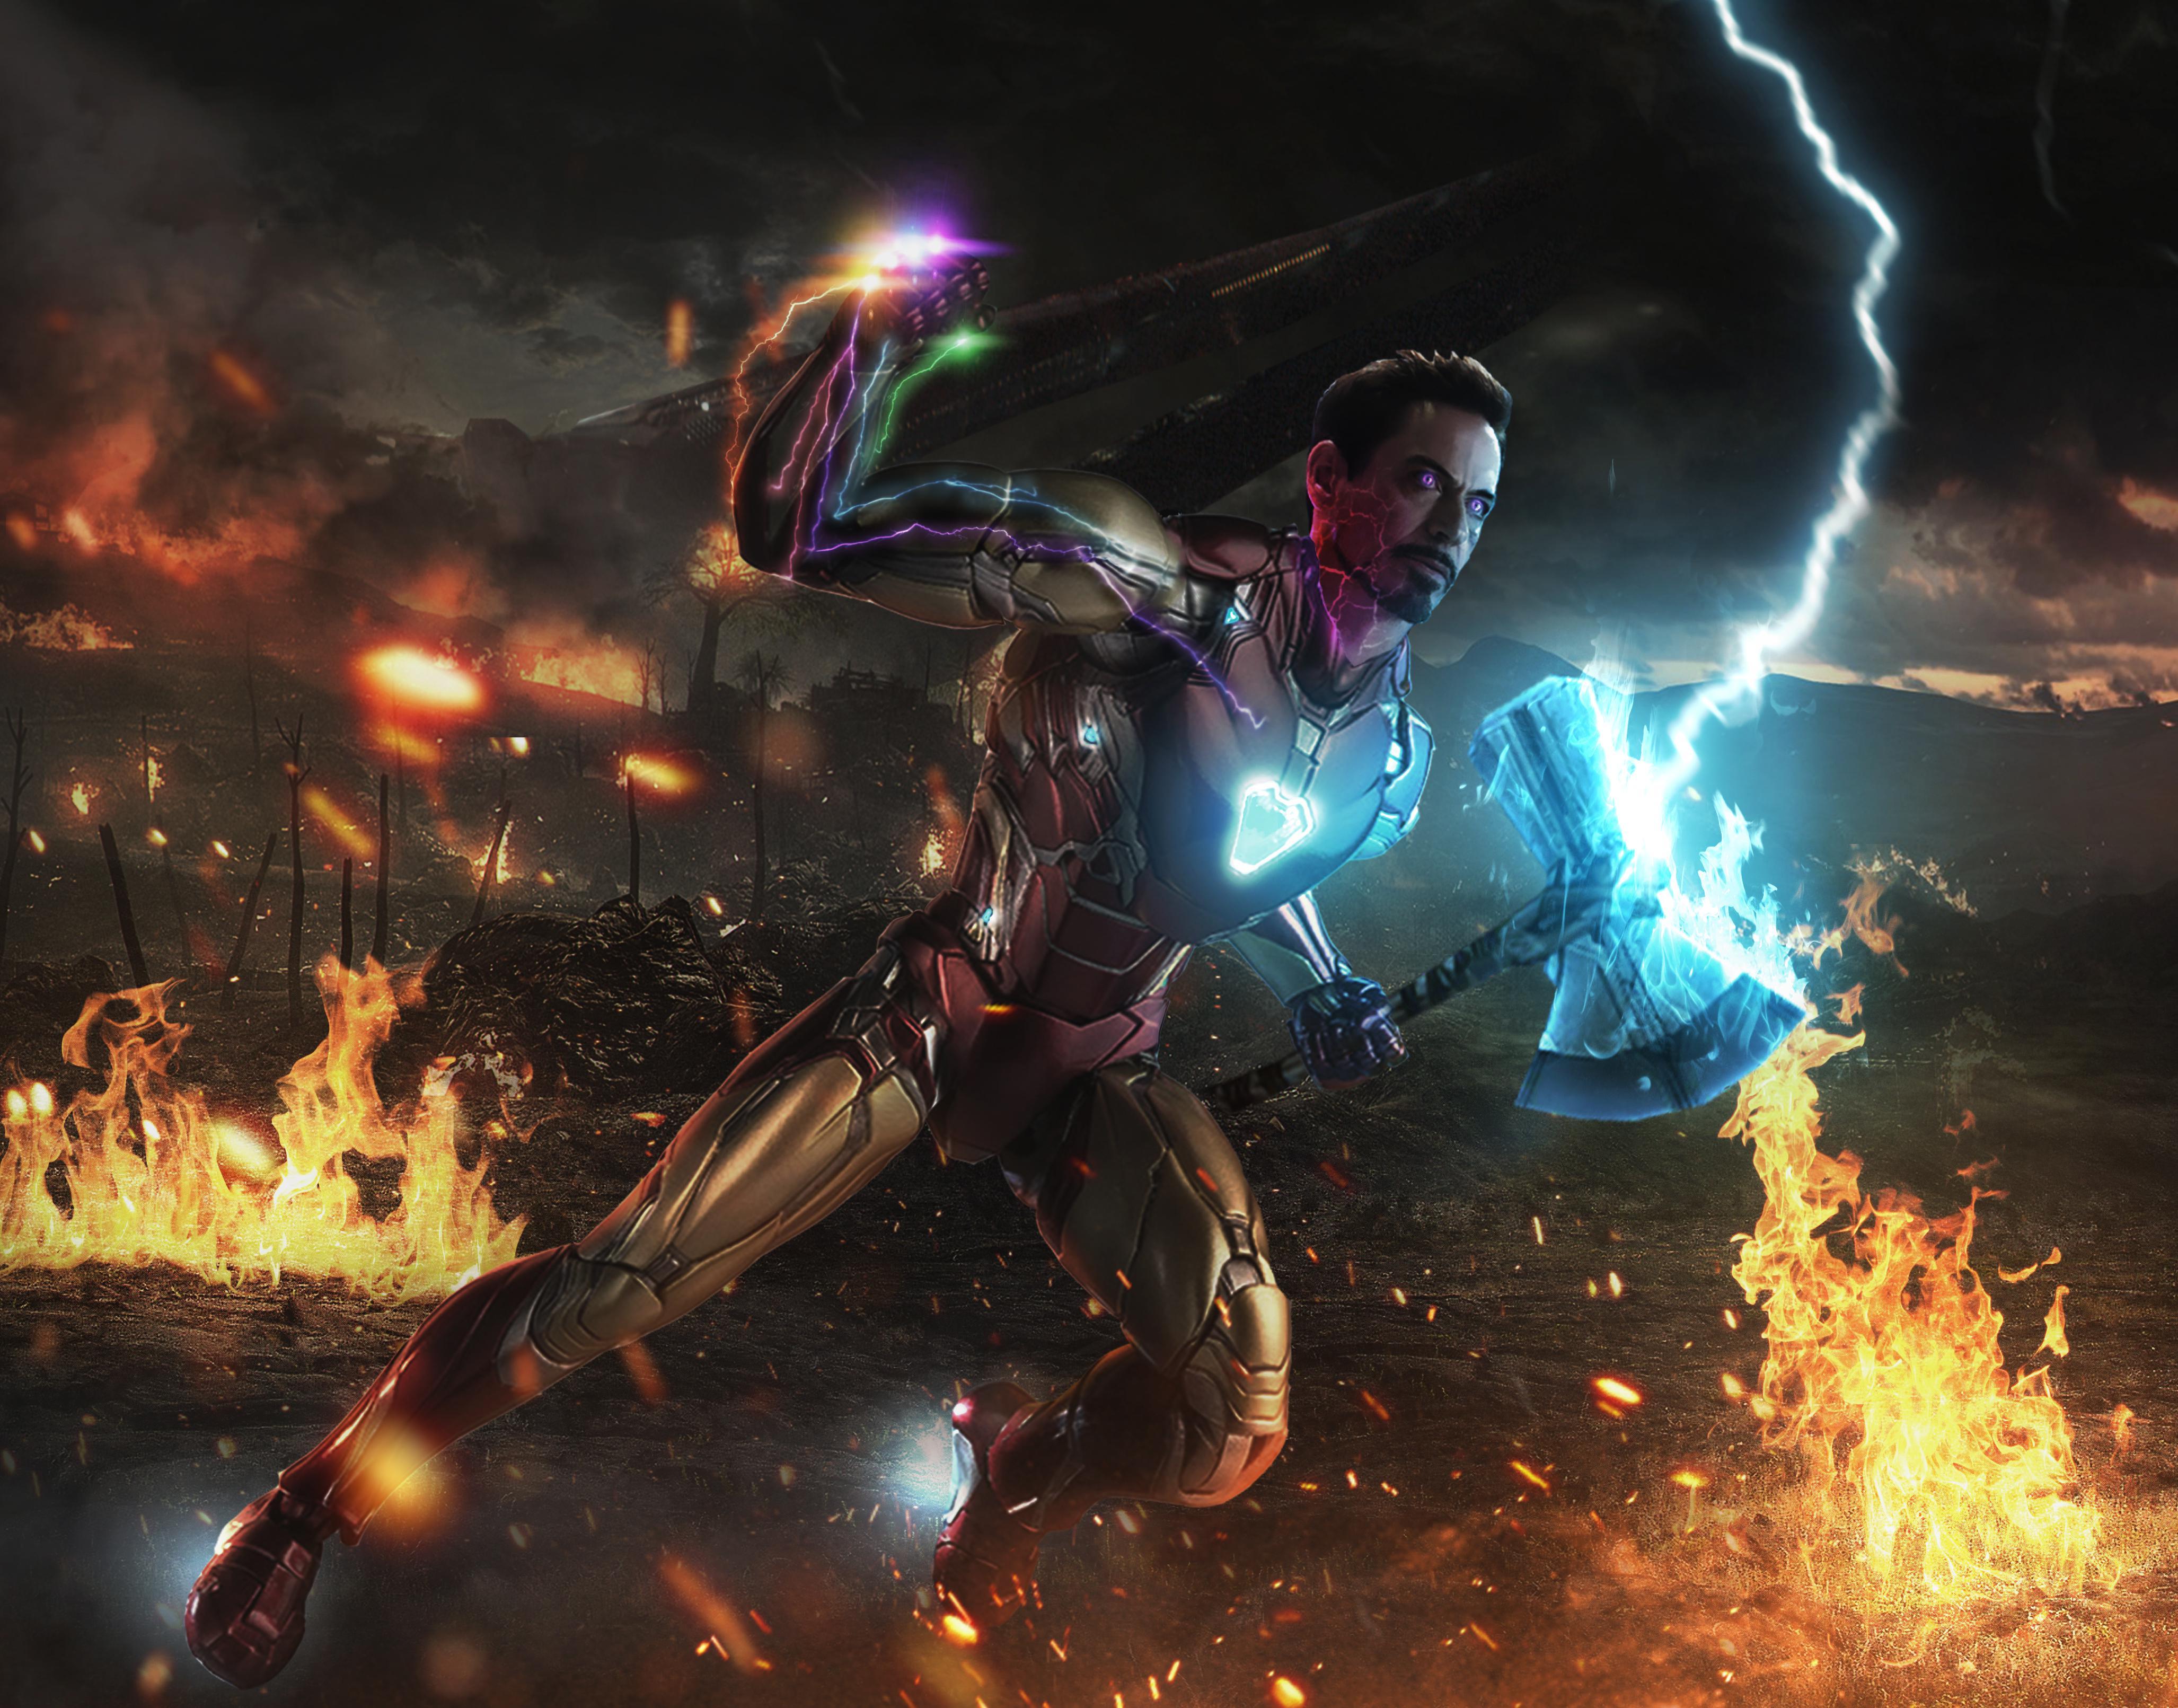 Iron Man With The Stones And Storm Breaker Marvelstudios